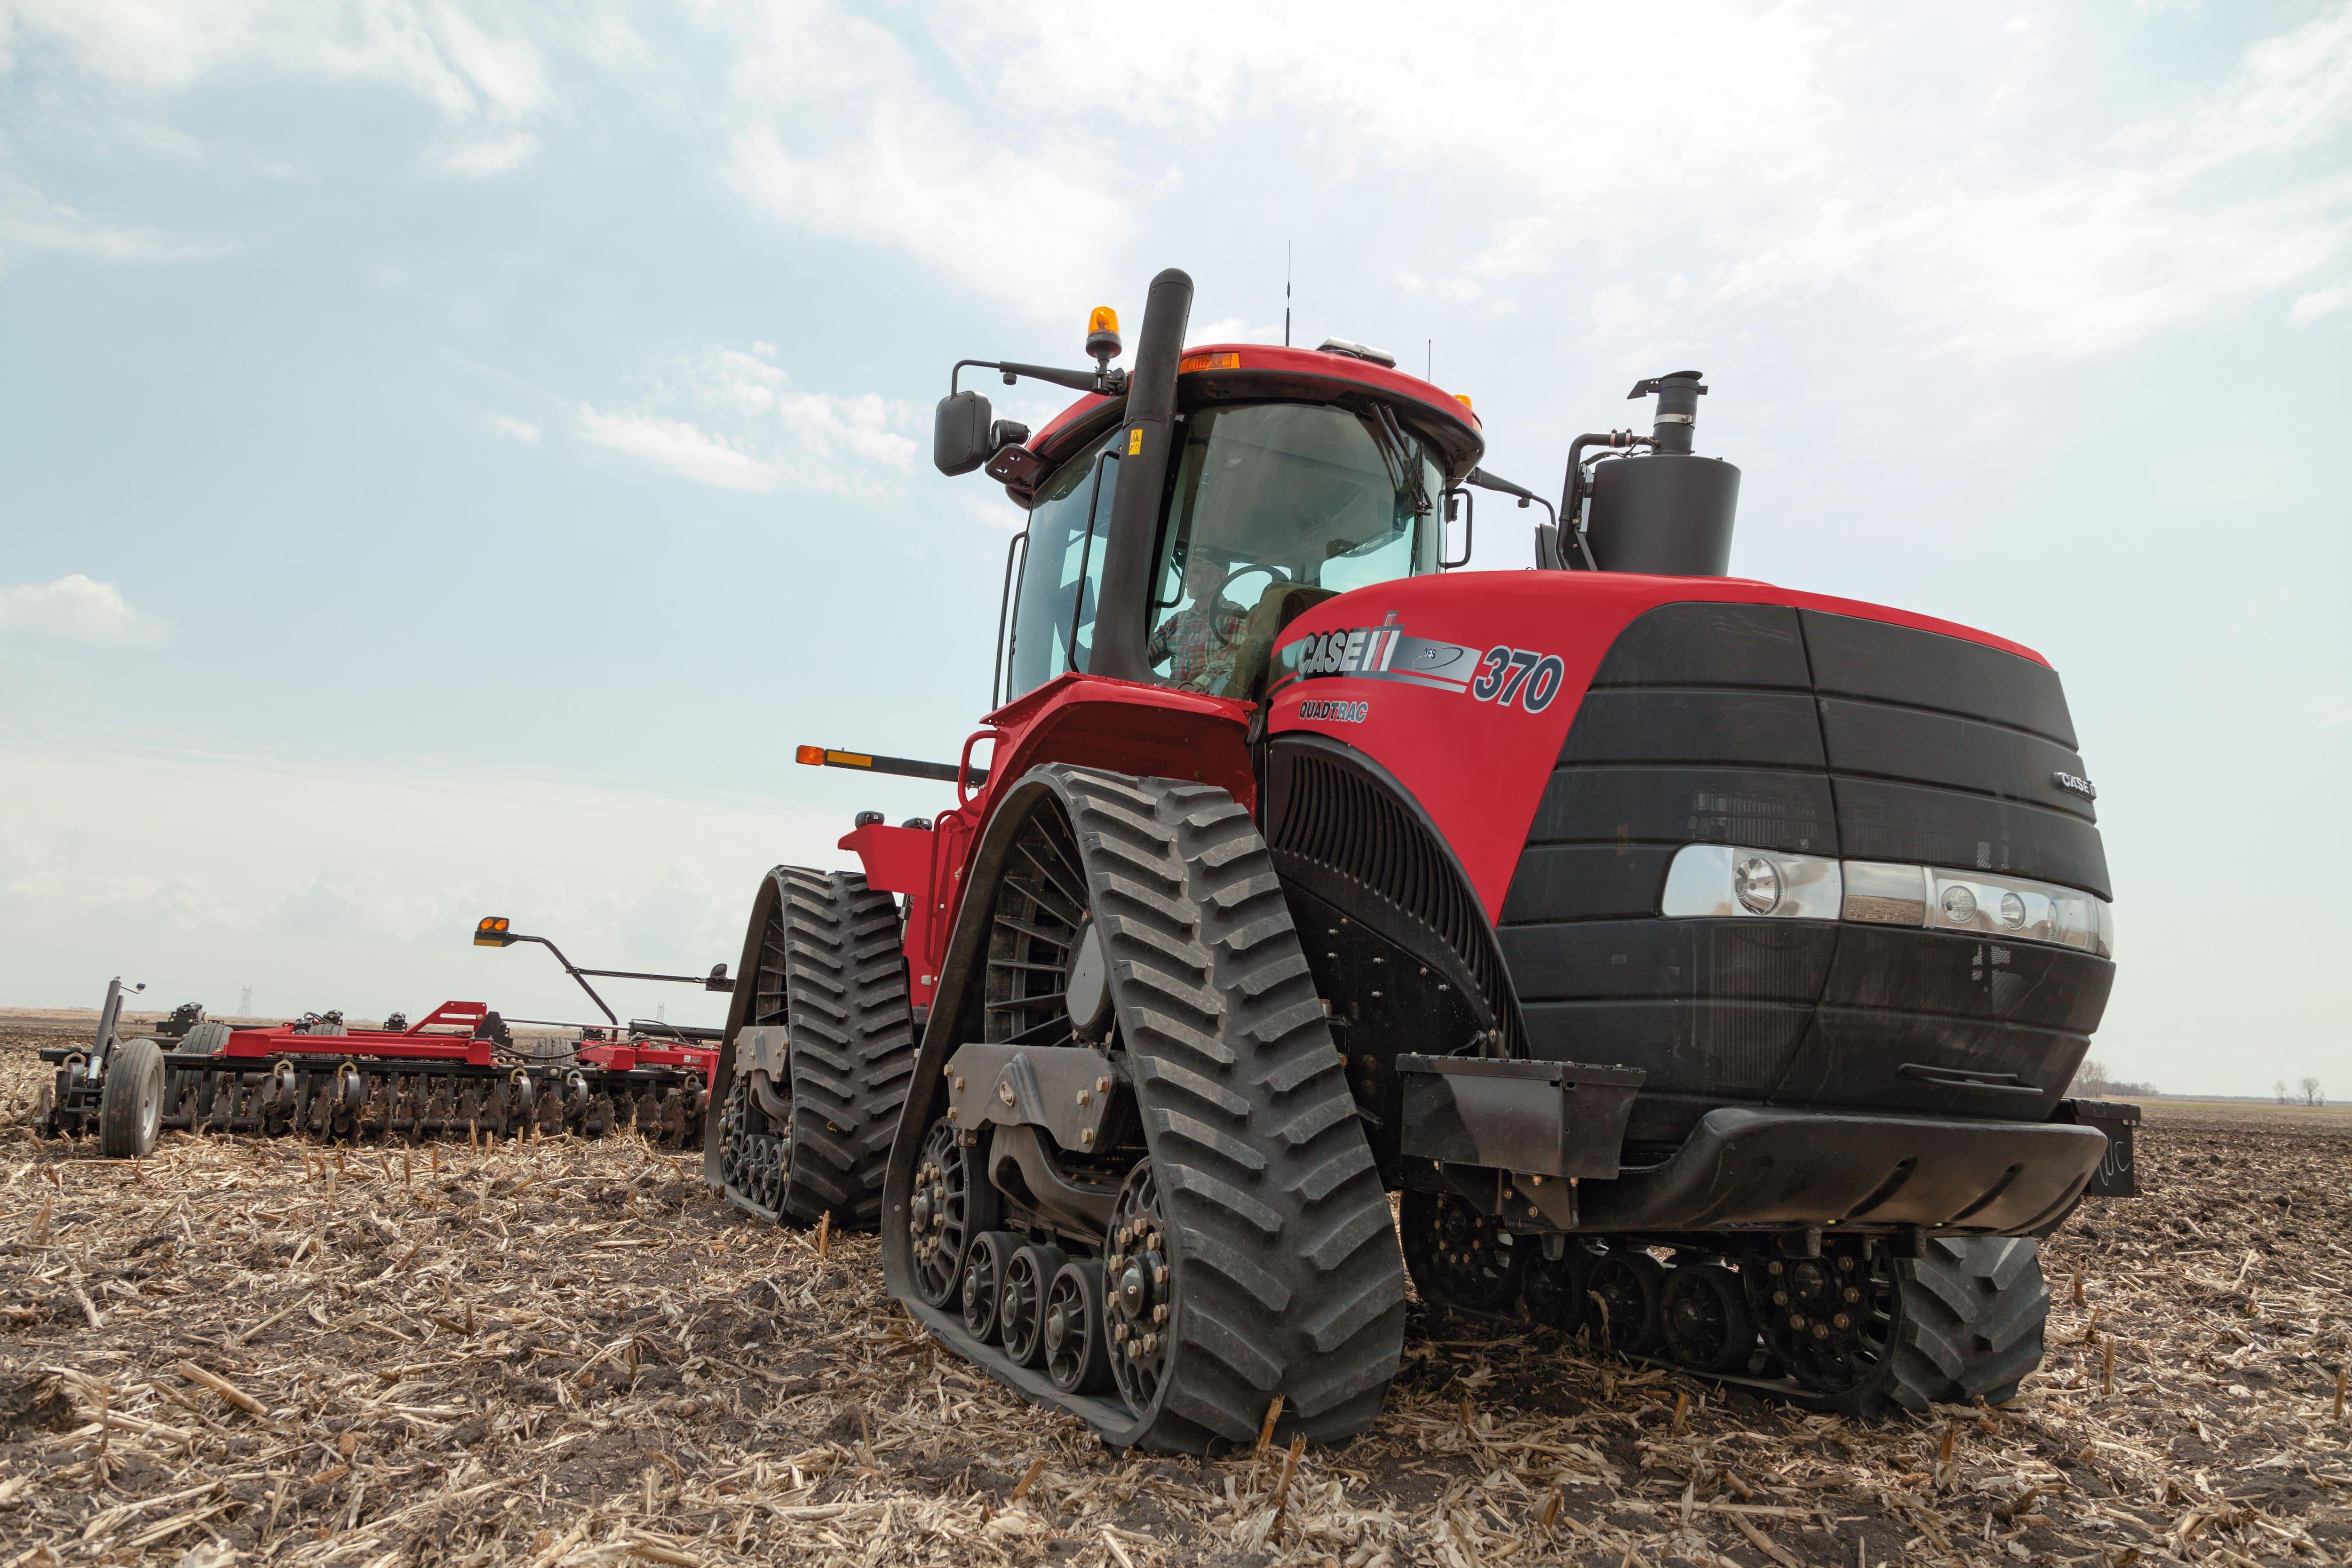 Steiger 370 High Horsepower Rowtrac Tractor Case Ih 350 Wiring Diagram